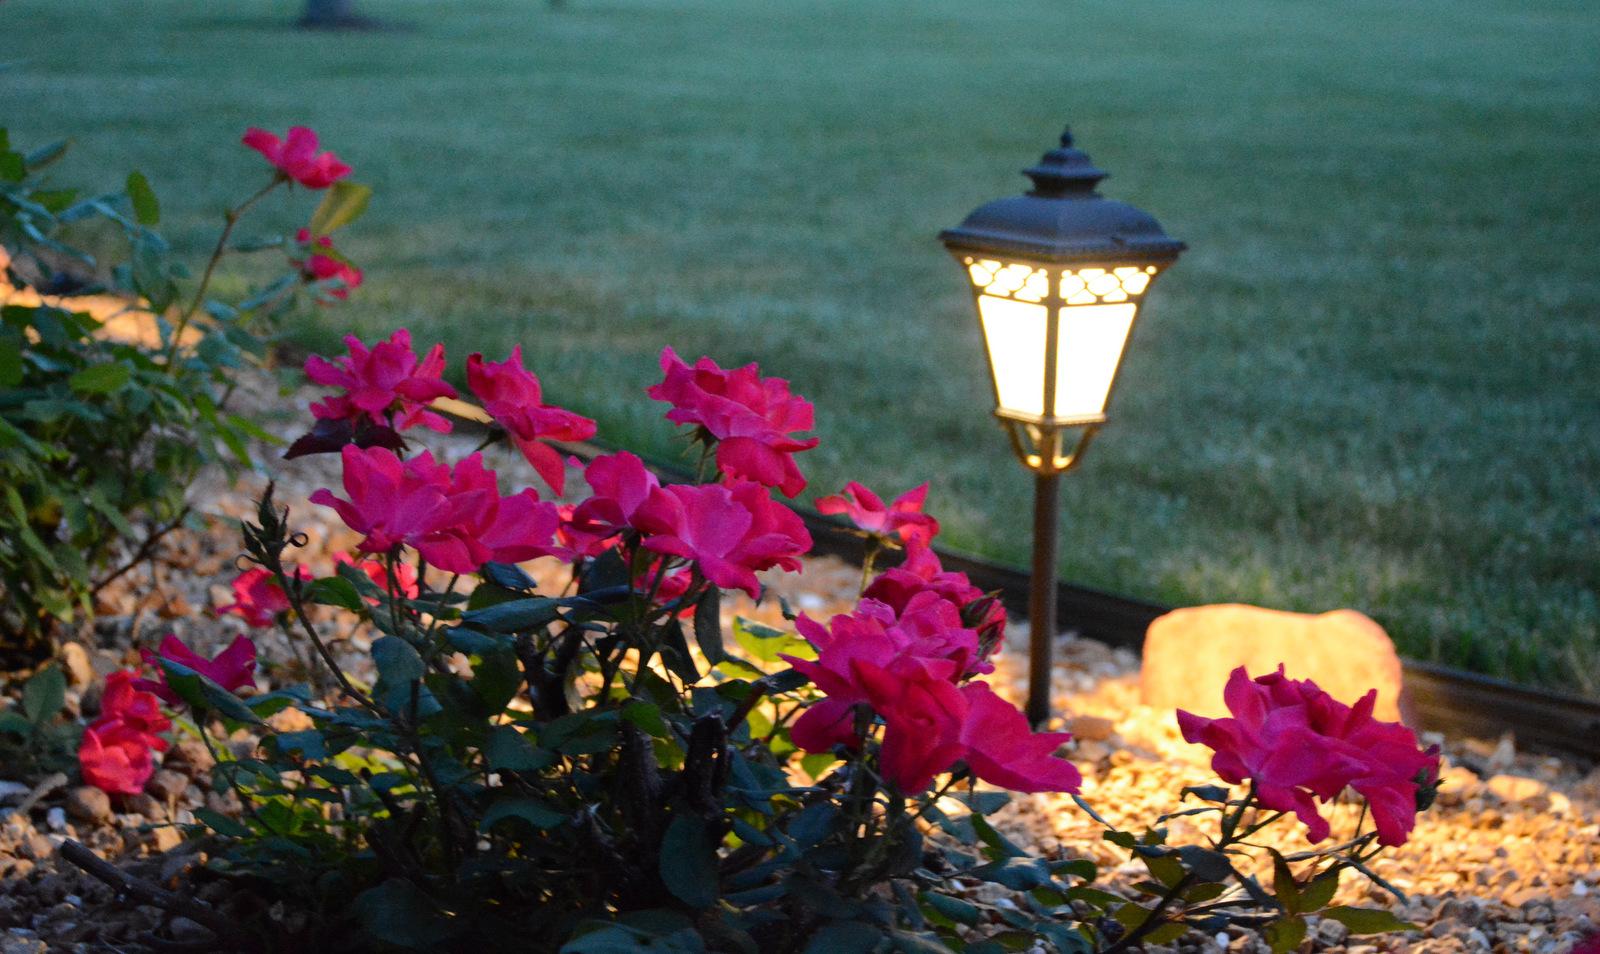 Evening Roses 6.10.15